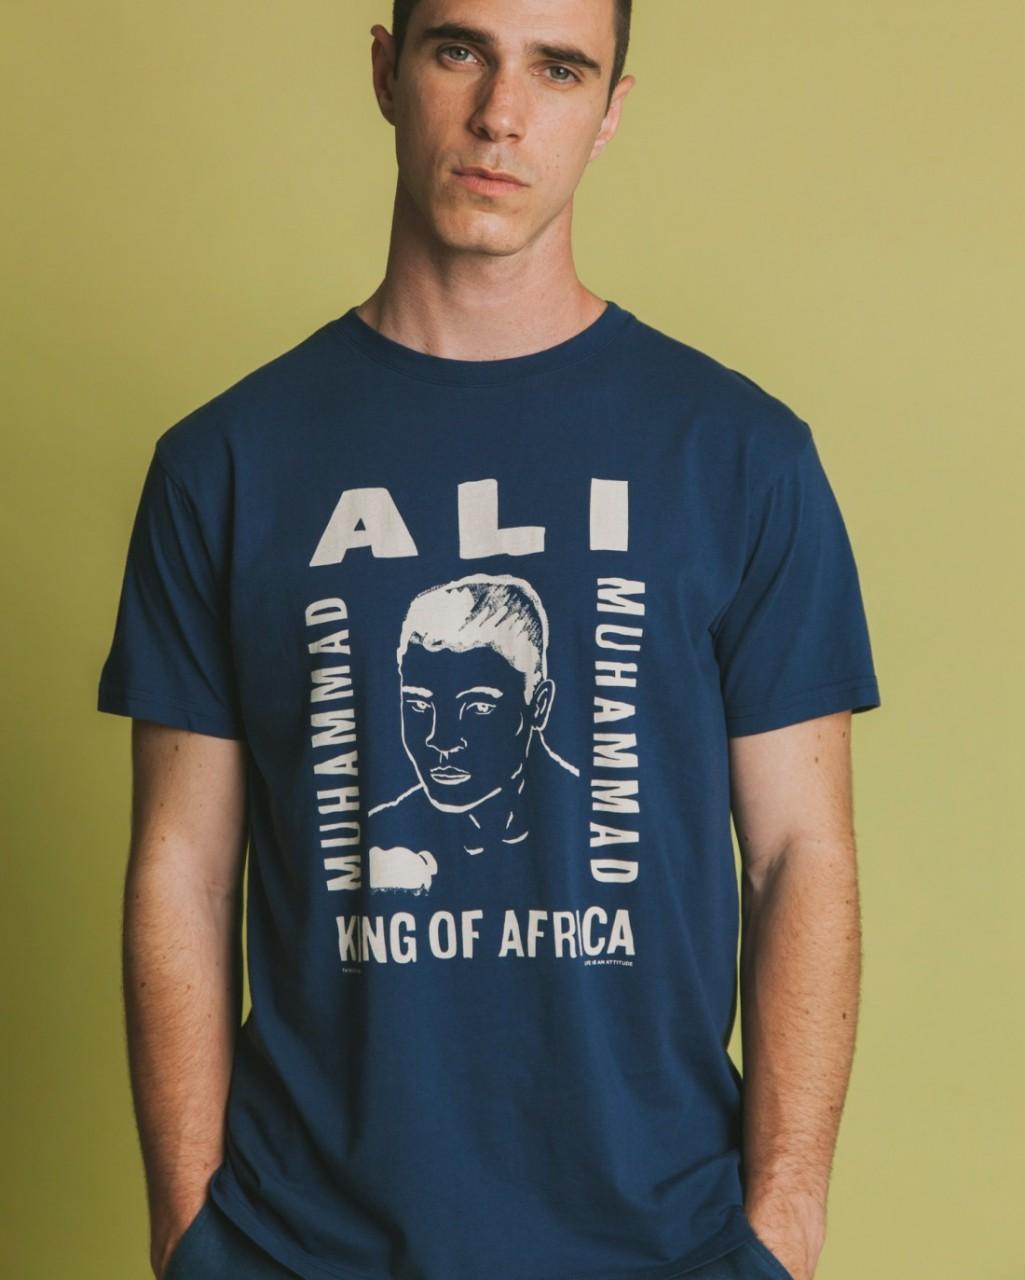 ALI T-SHIRT BLUE